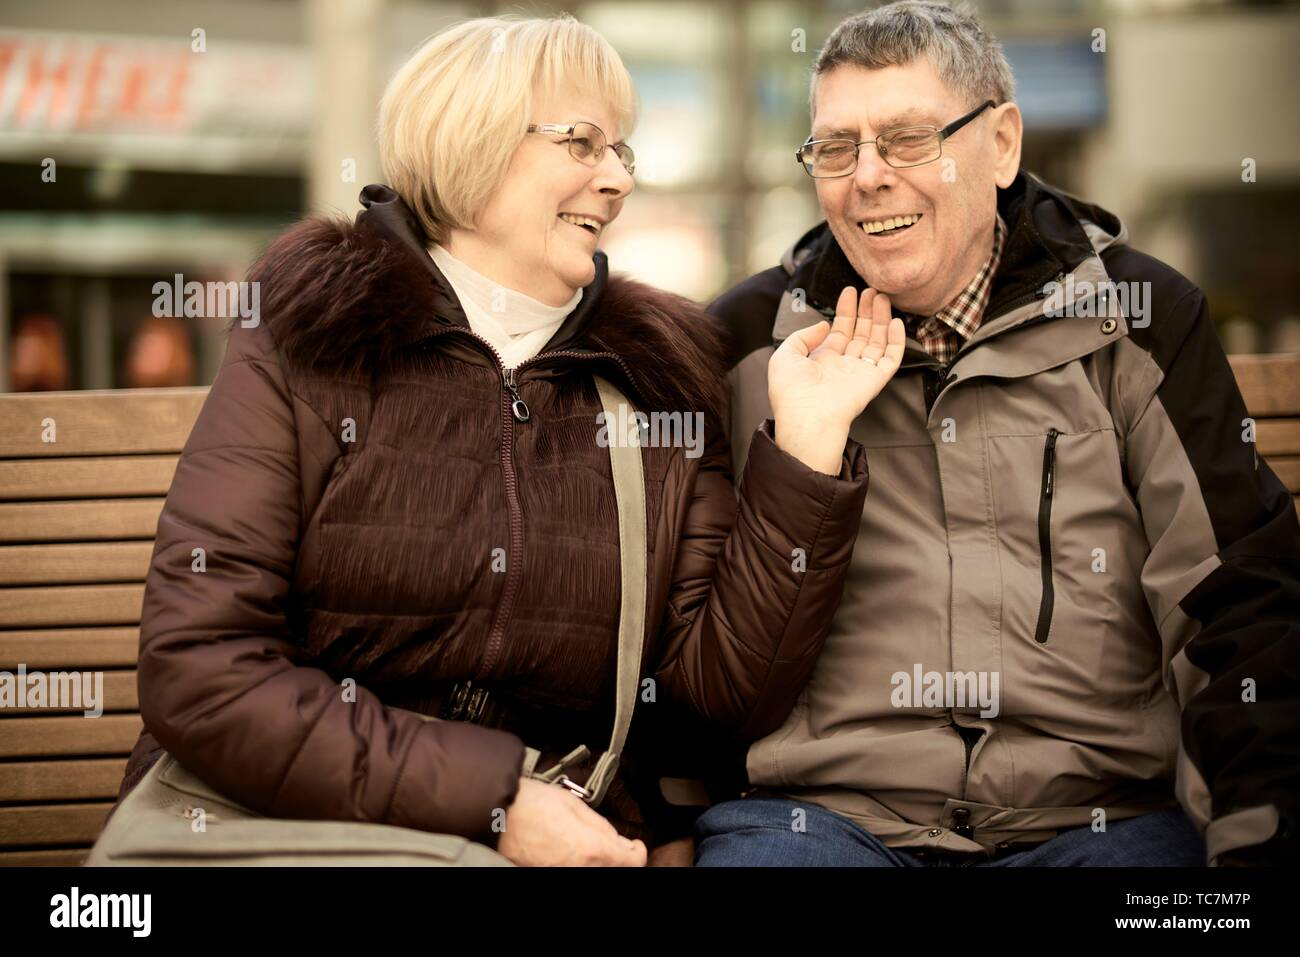 senior woman tickling senior man, jolly aged senior couple sitting on bench, enjoying togetherness, happiness, in Cottbus, Brandenburg, Germany. - Stock Image